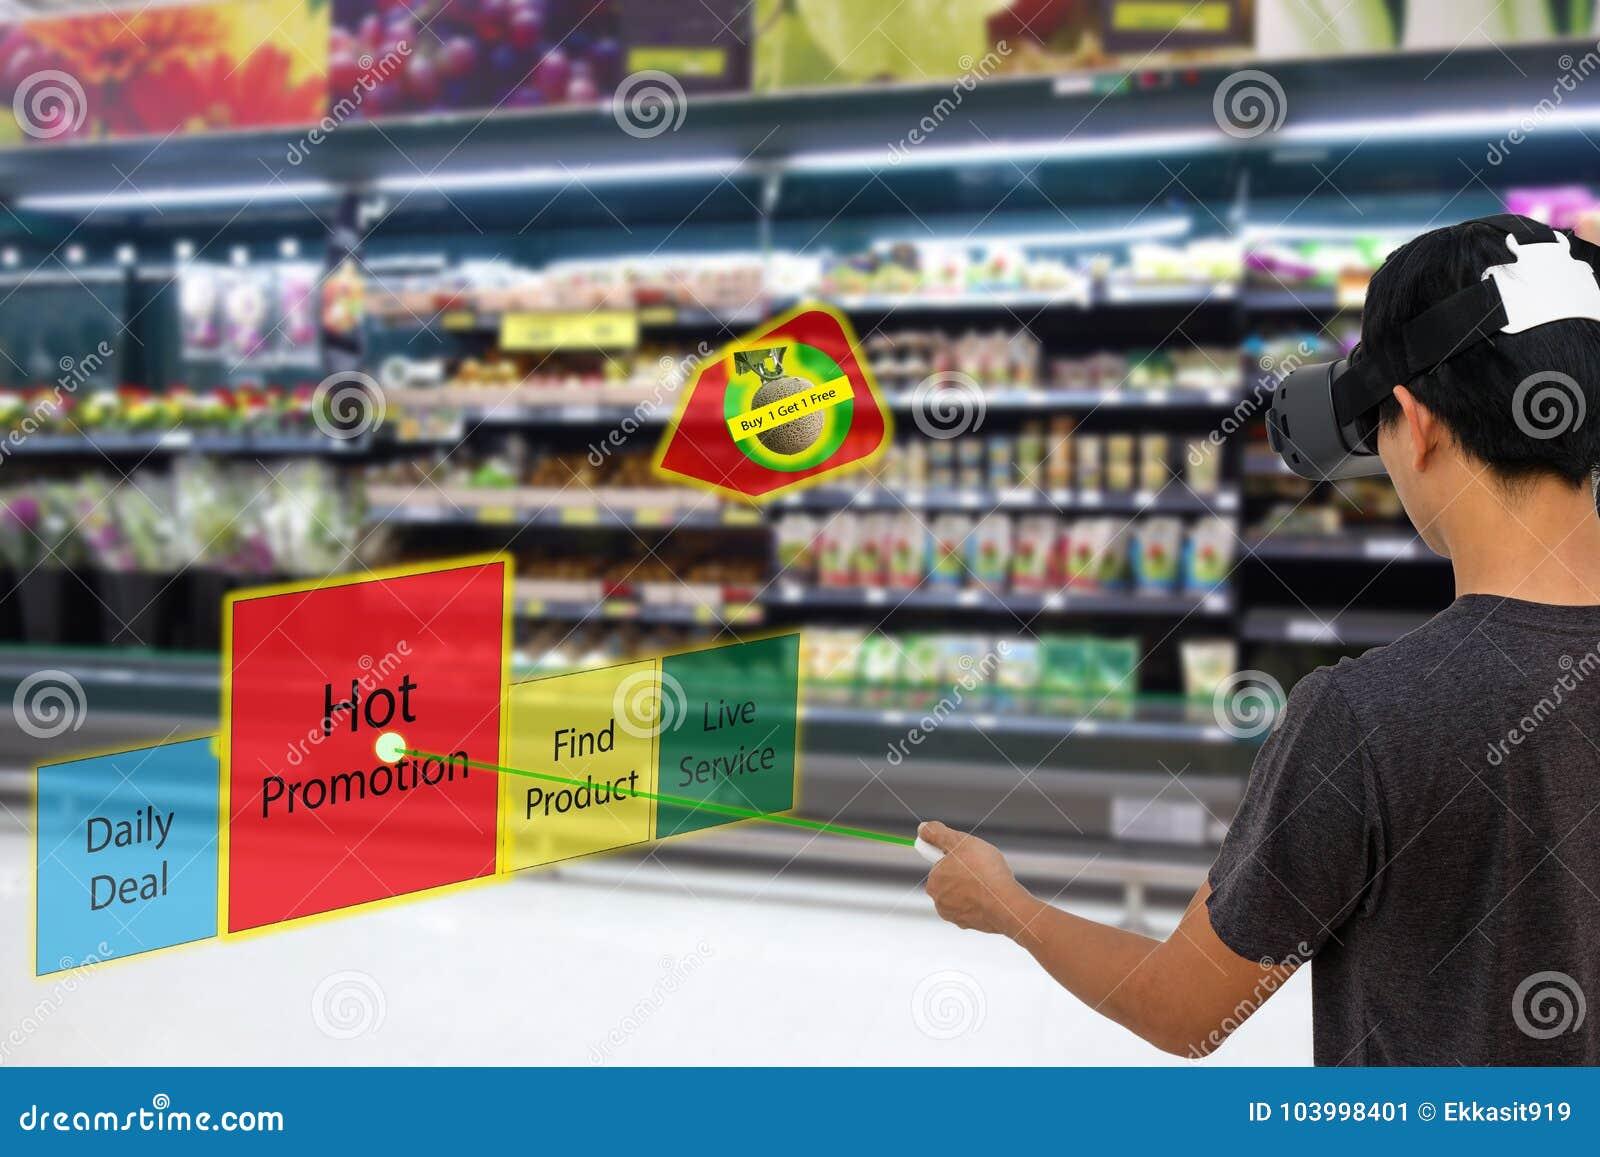 Slimme kleinhandels met vergrote en virtuele conce van de werkelijkheidstechnologie